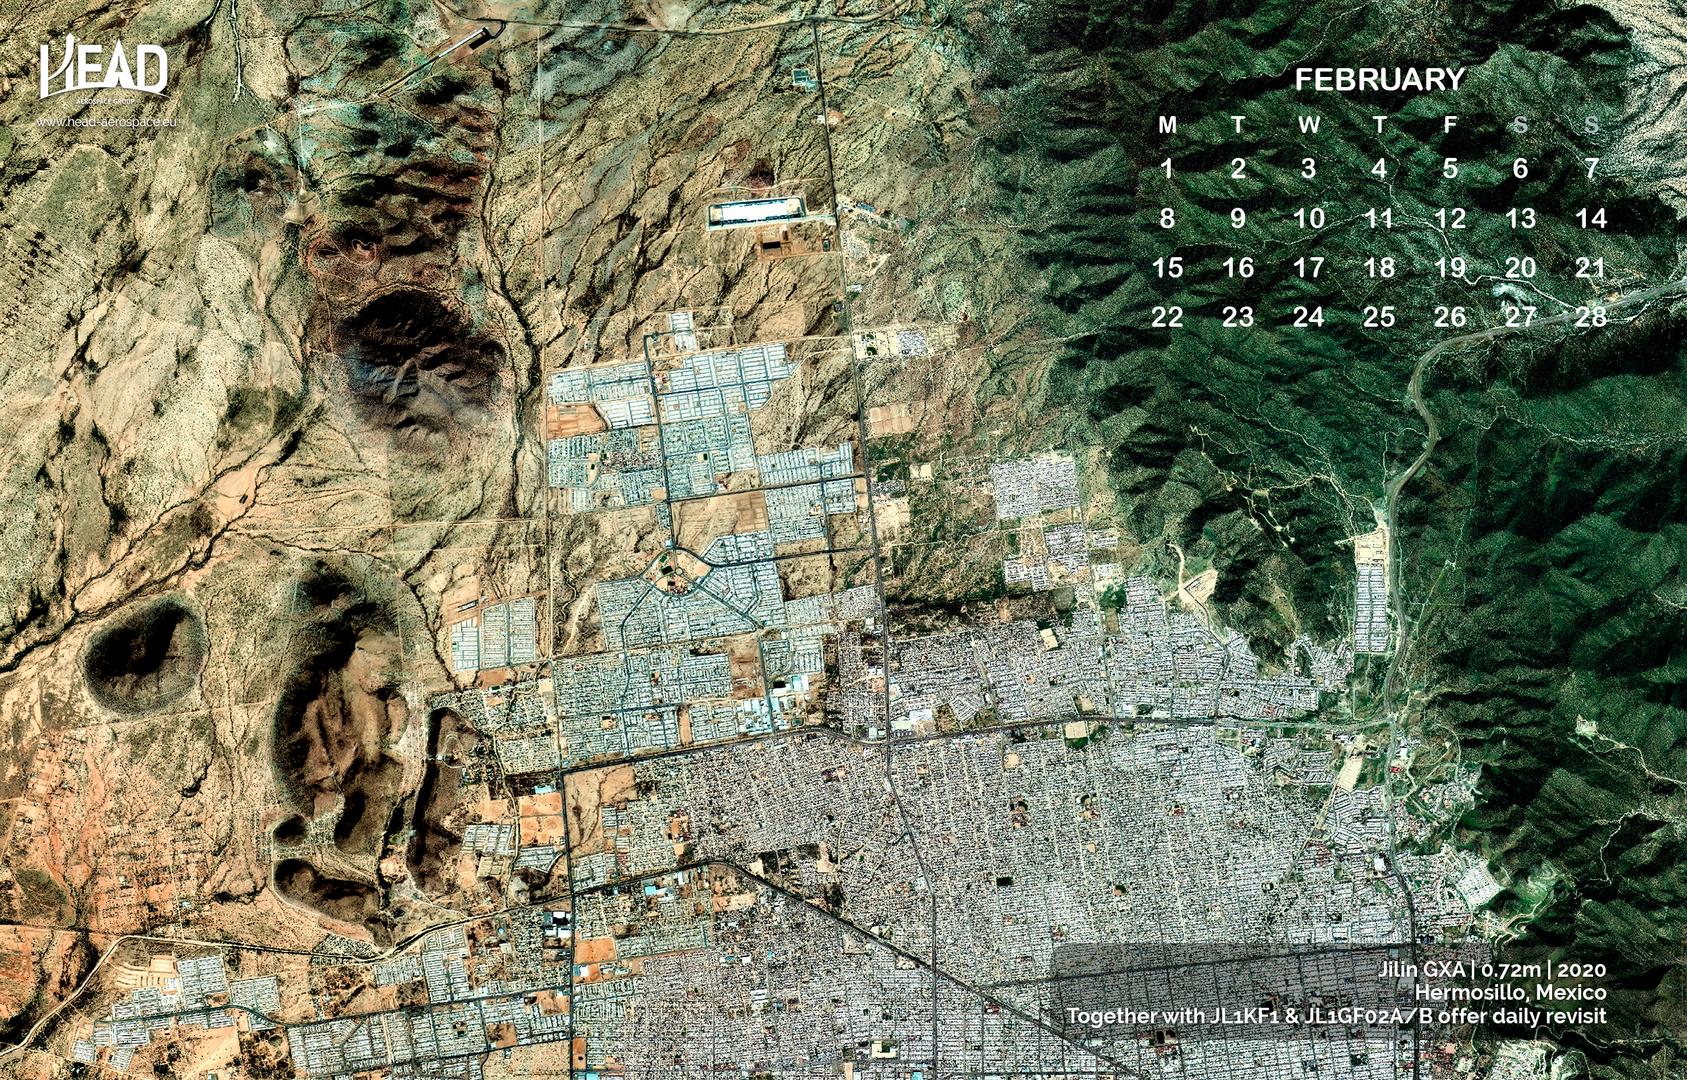 HEAD Wallpaper February 2021.png